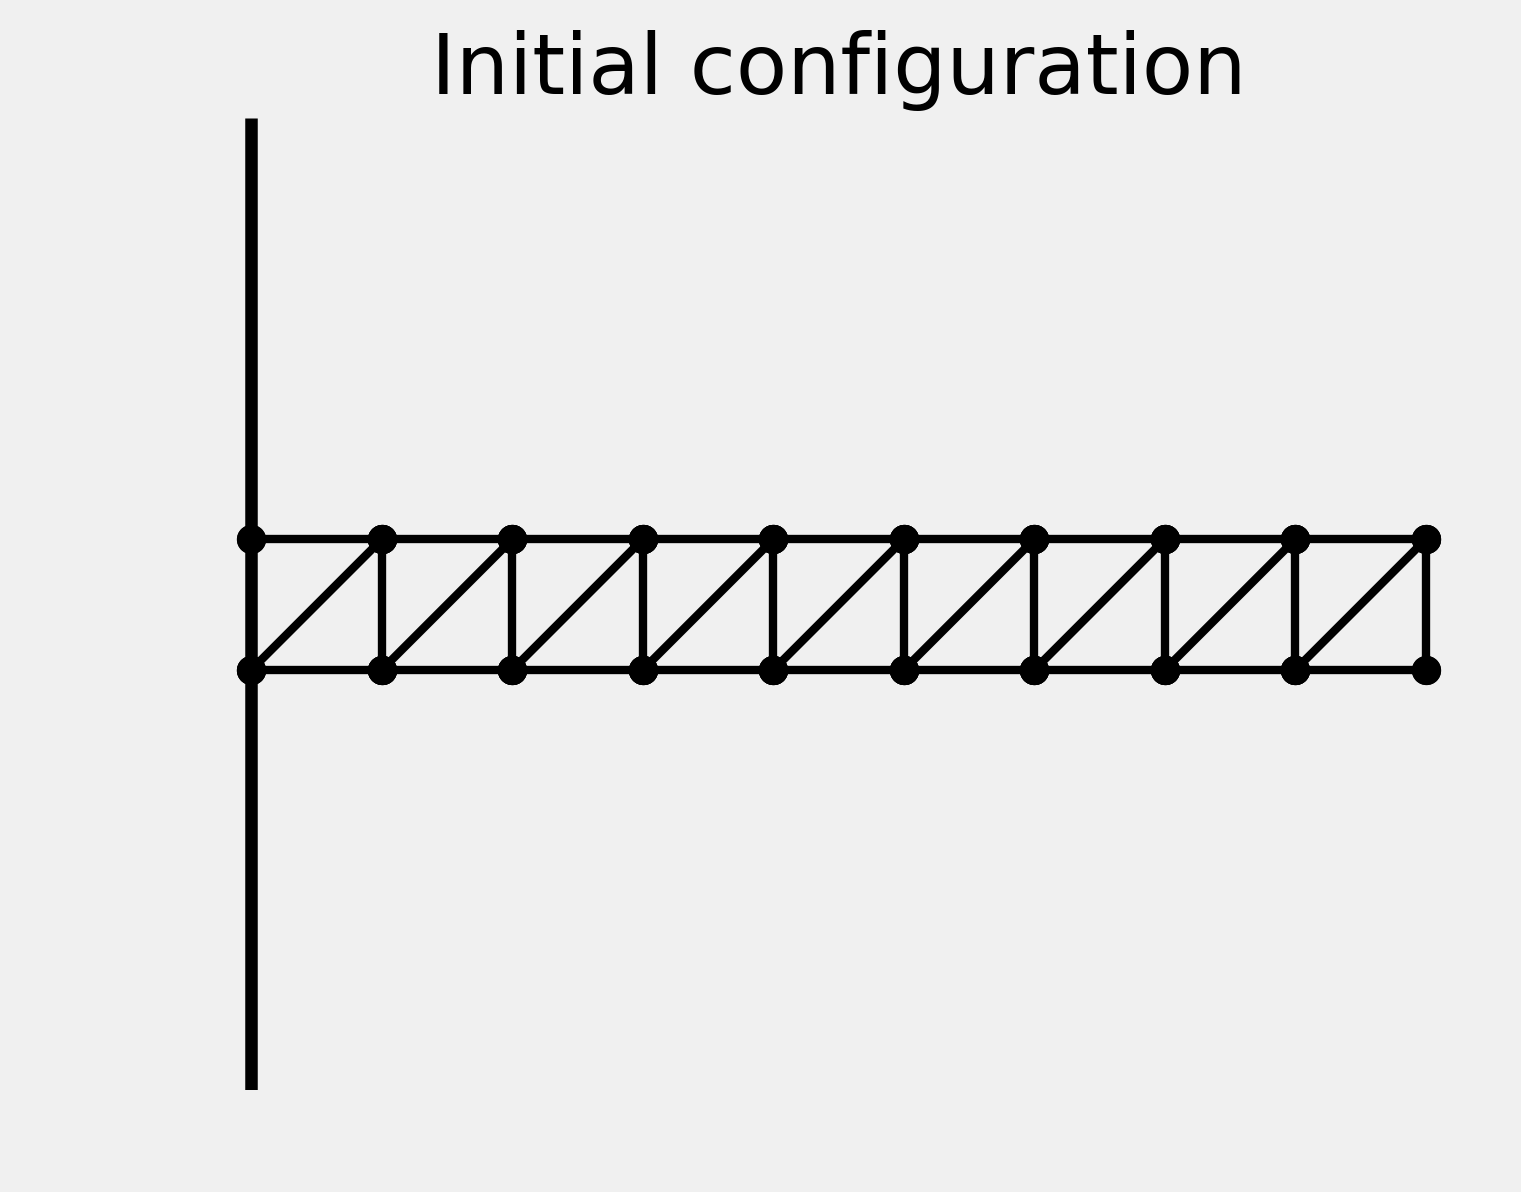 <matplotlib.figure.Figure at 0x7157668>